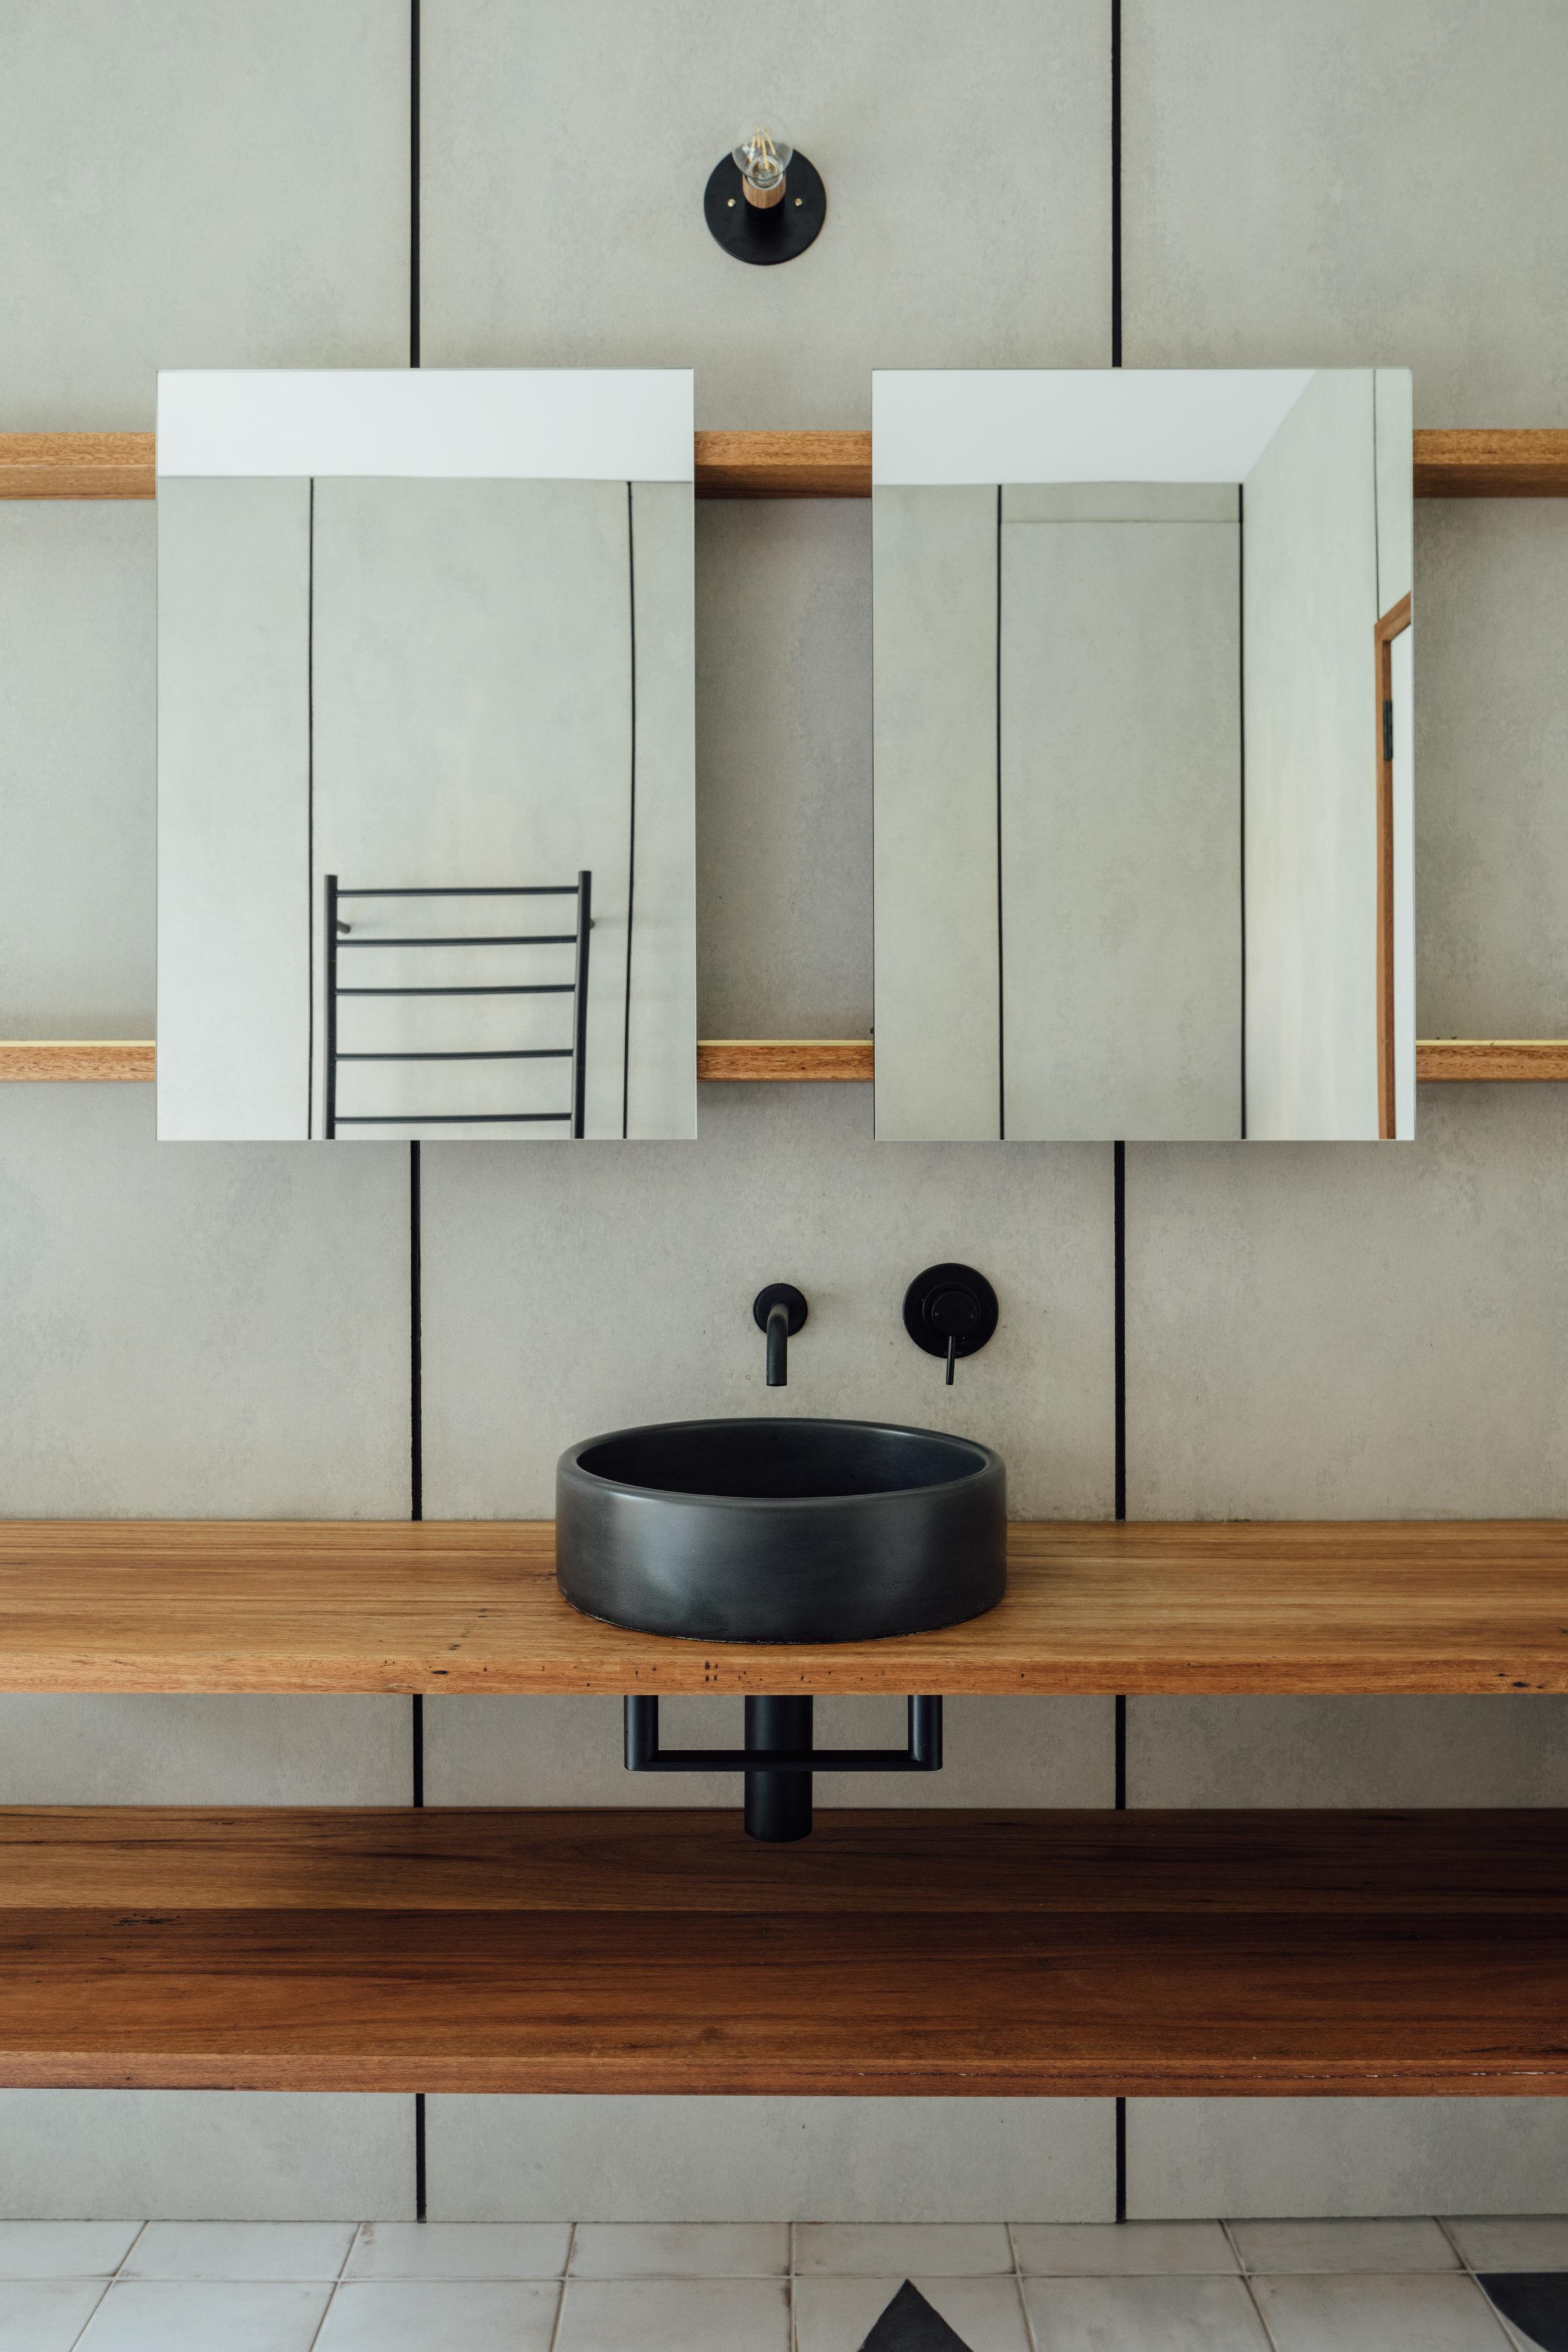 Takt exoskeleton house bathroom hardwood vanity.jpg